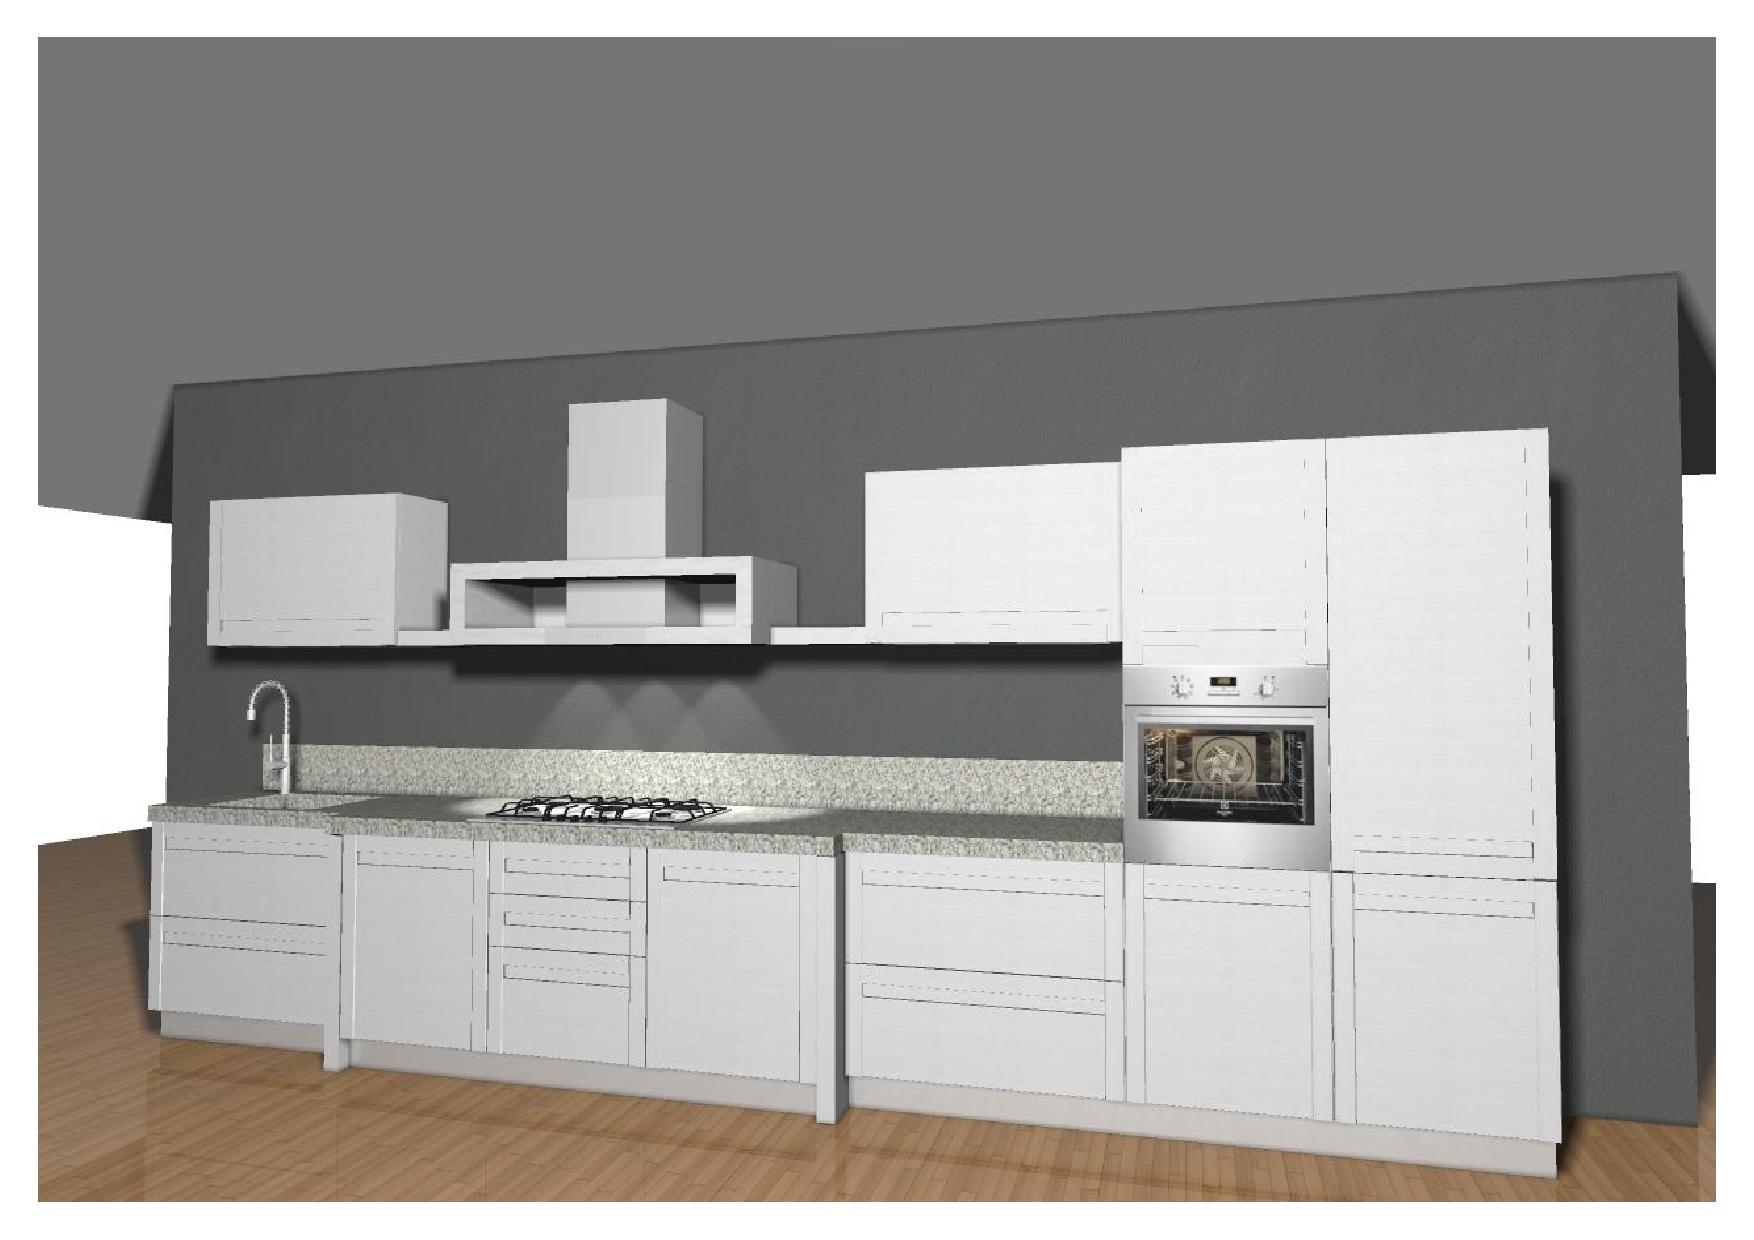 Emejing Cucine Legno Massello Prezzi Photos - Home Ideas - tyger.us